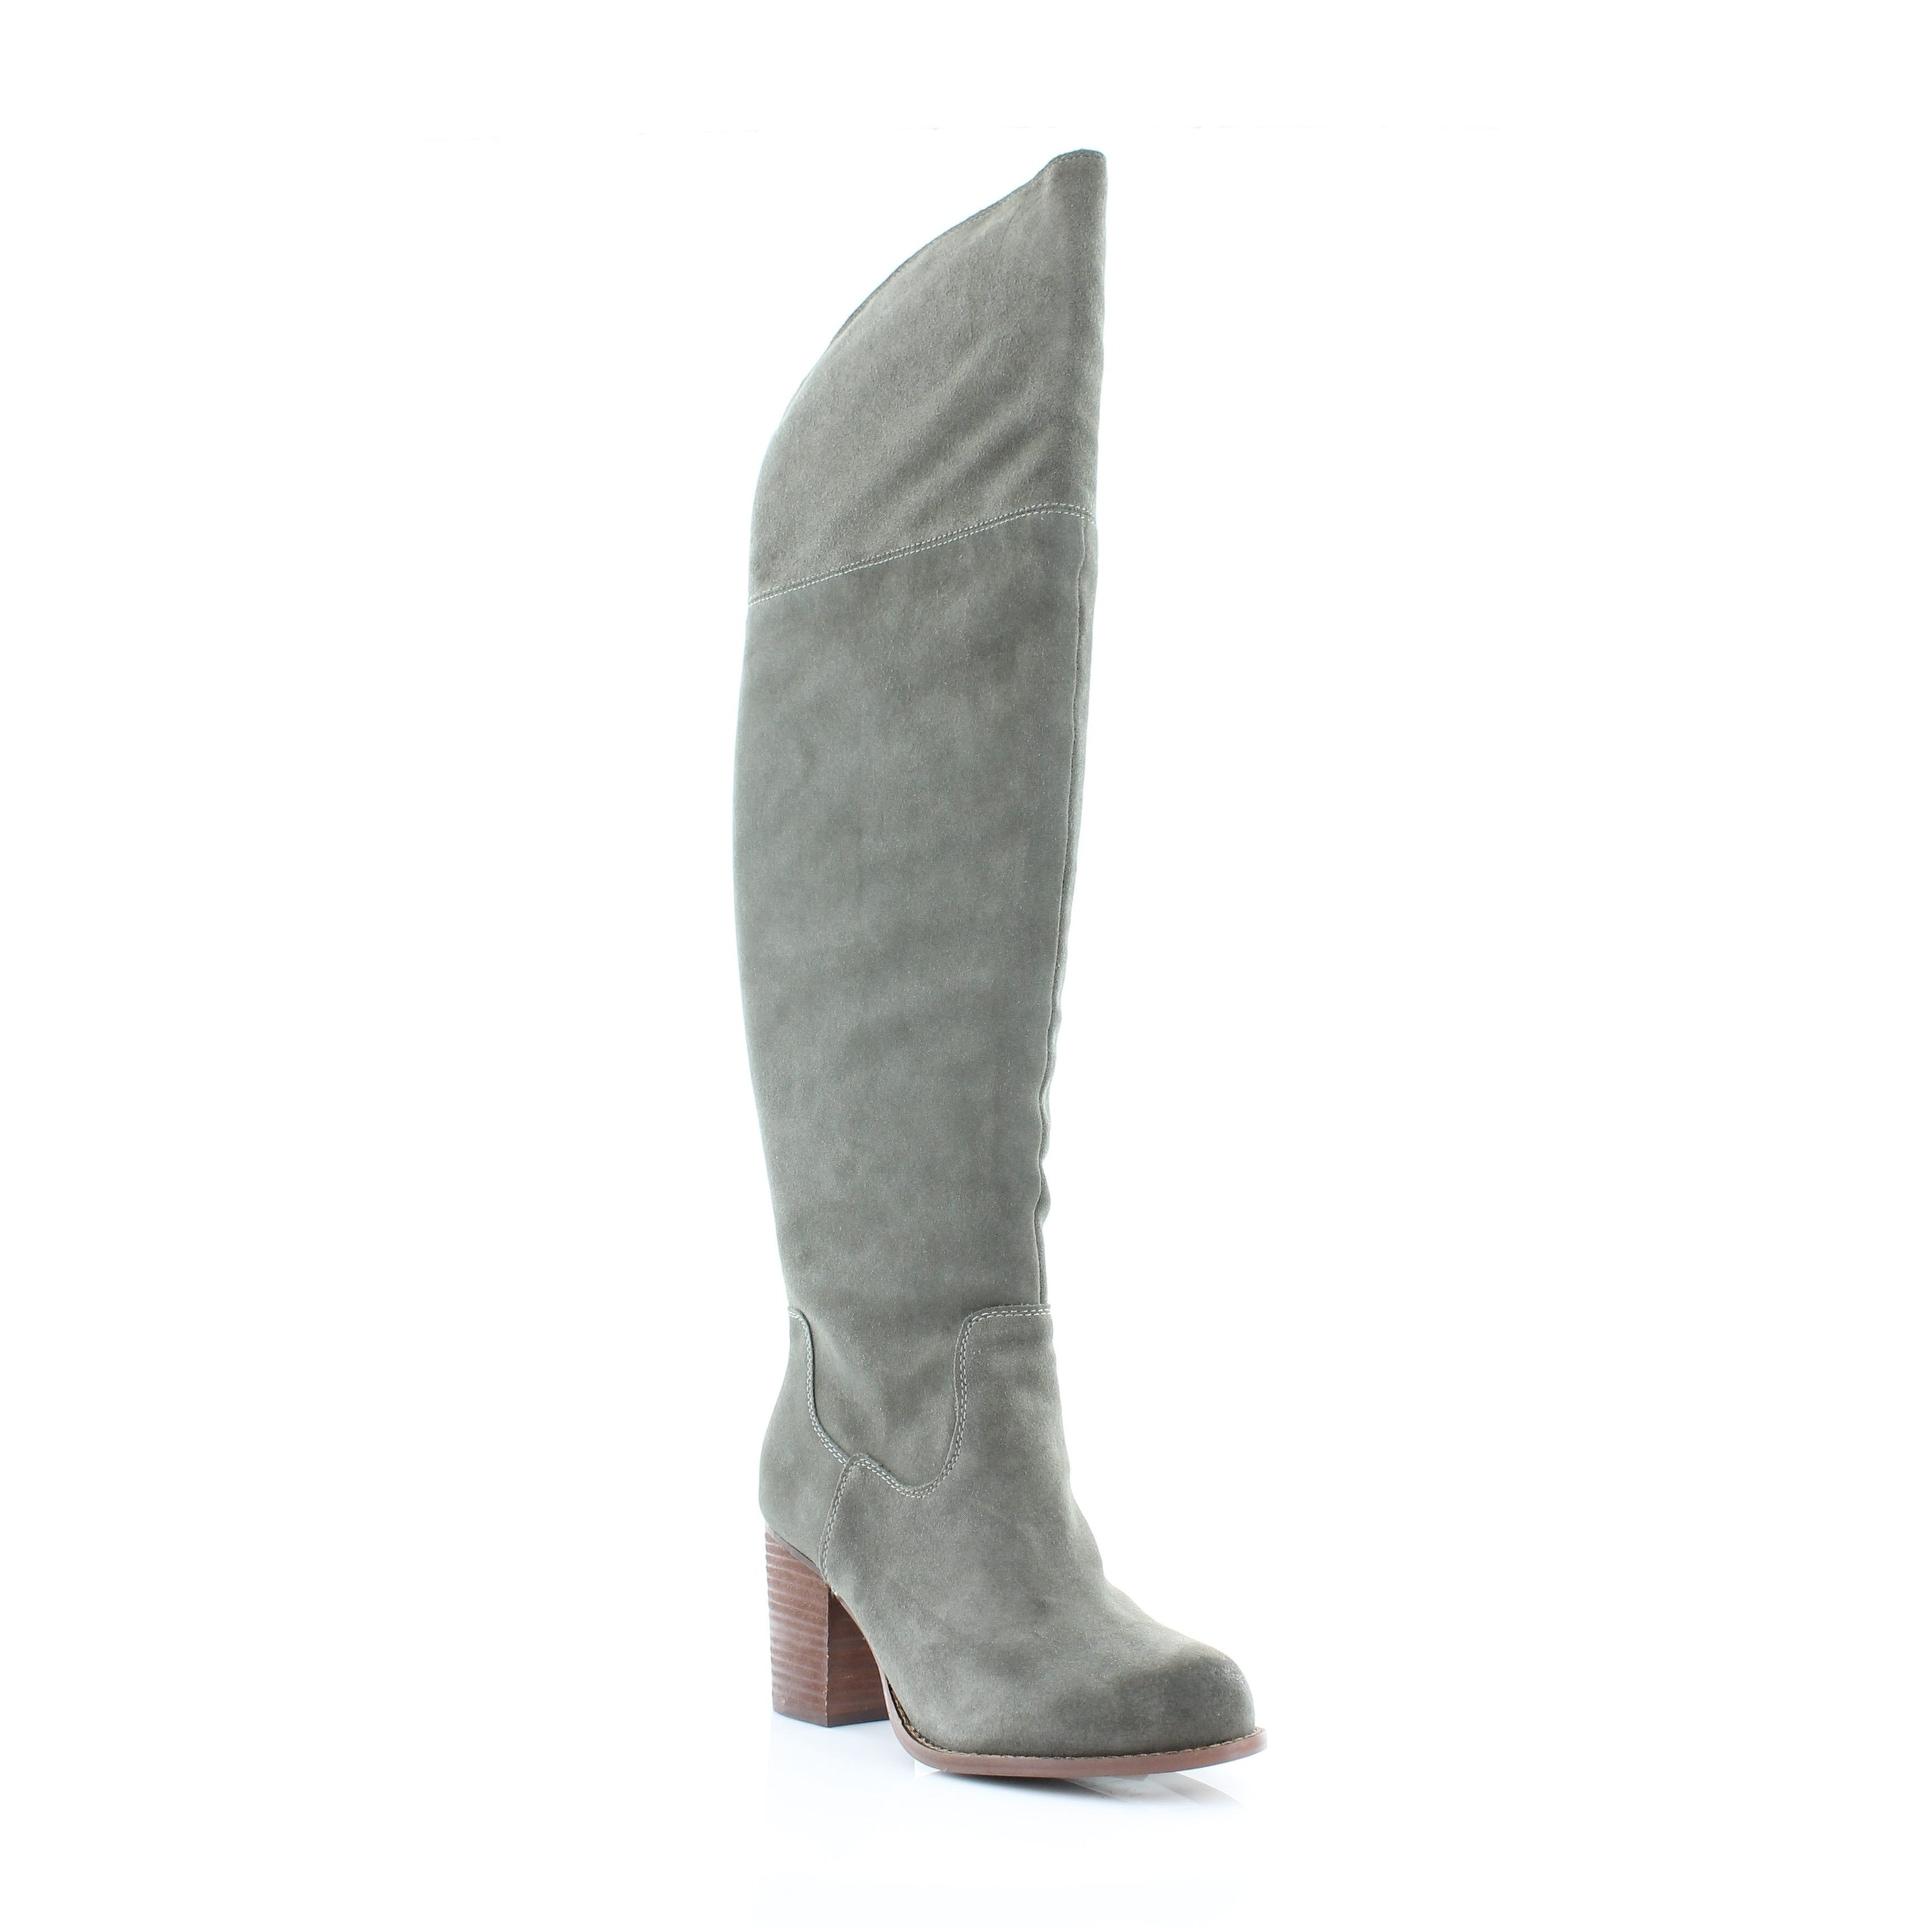 d871e97b31f Shop Splendid Loretta Women s Boots Grey - 7 - Free Shipping Today -  Overstock.com - 21554548